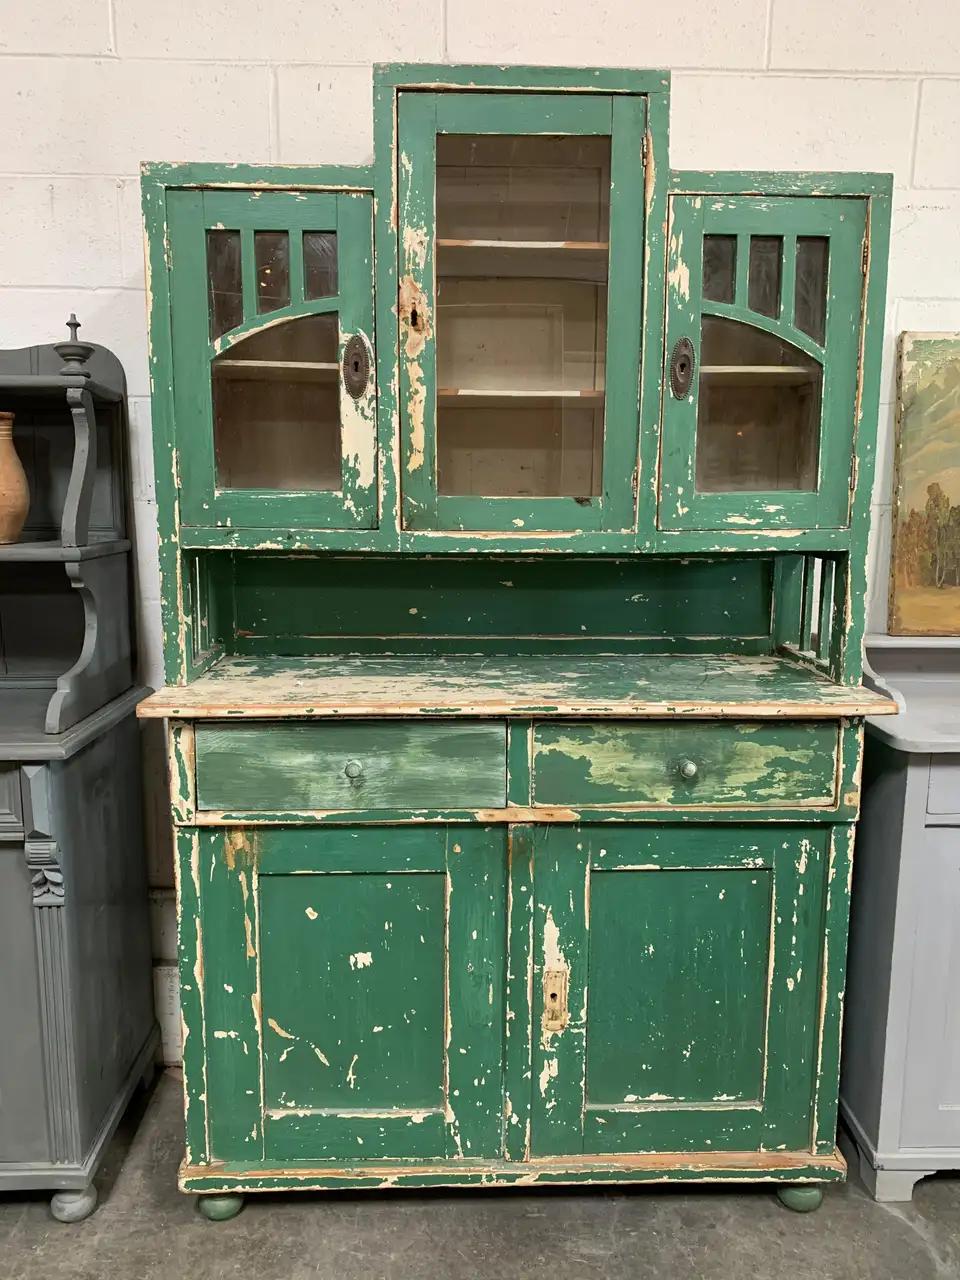 Craigslist Worcester Ma Furniture By Owner - LISTCRAG